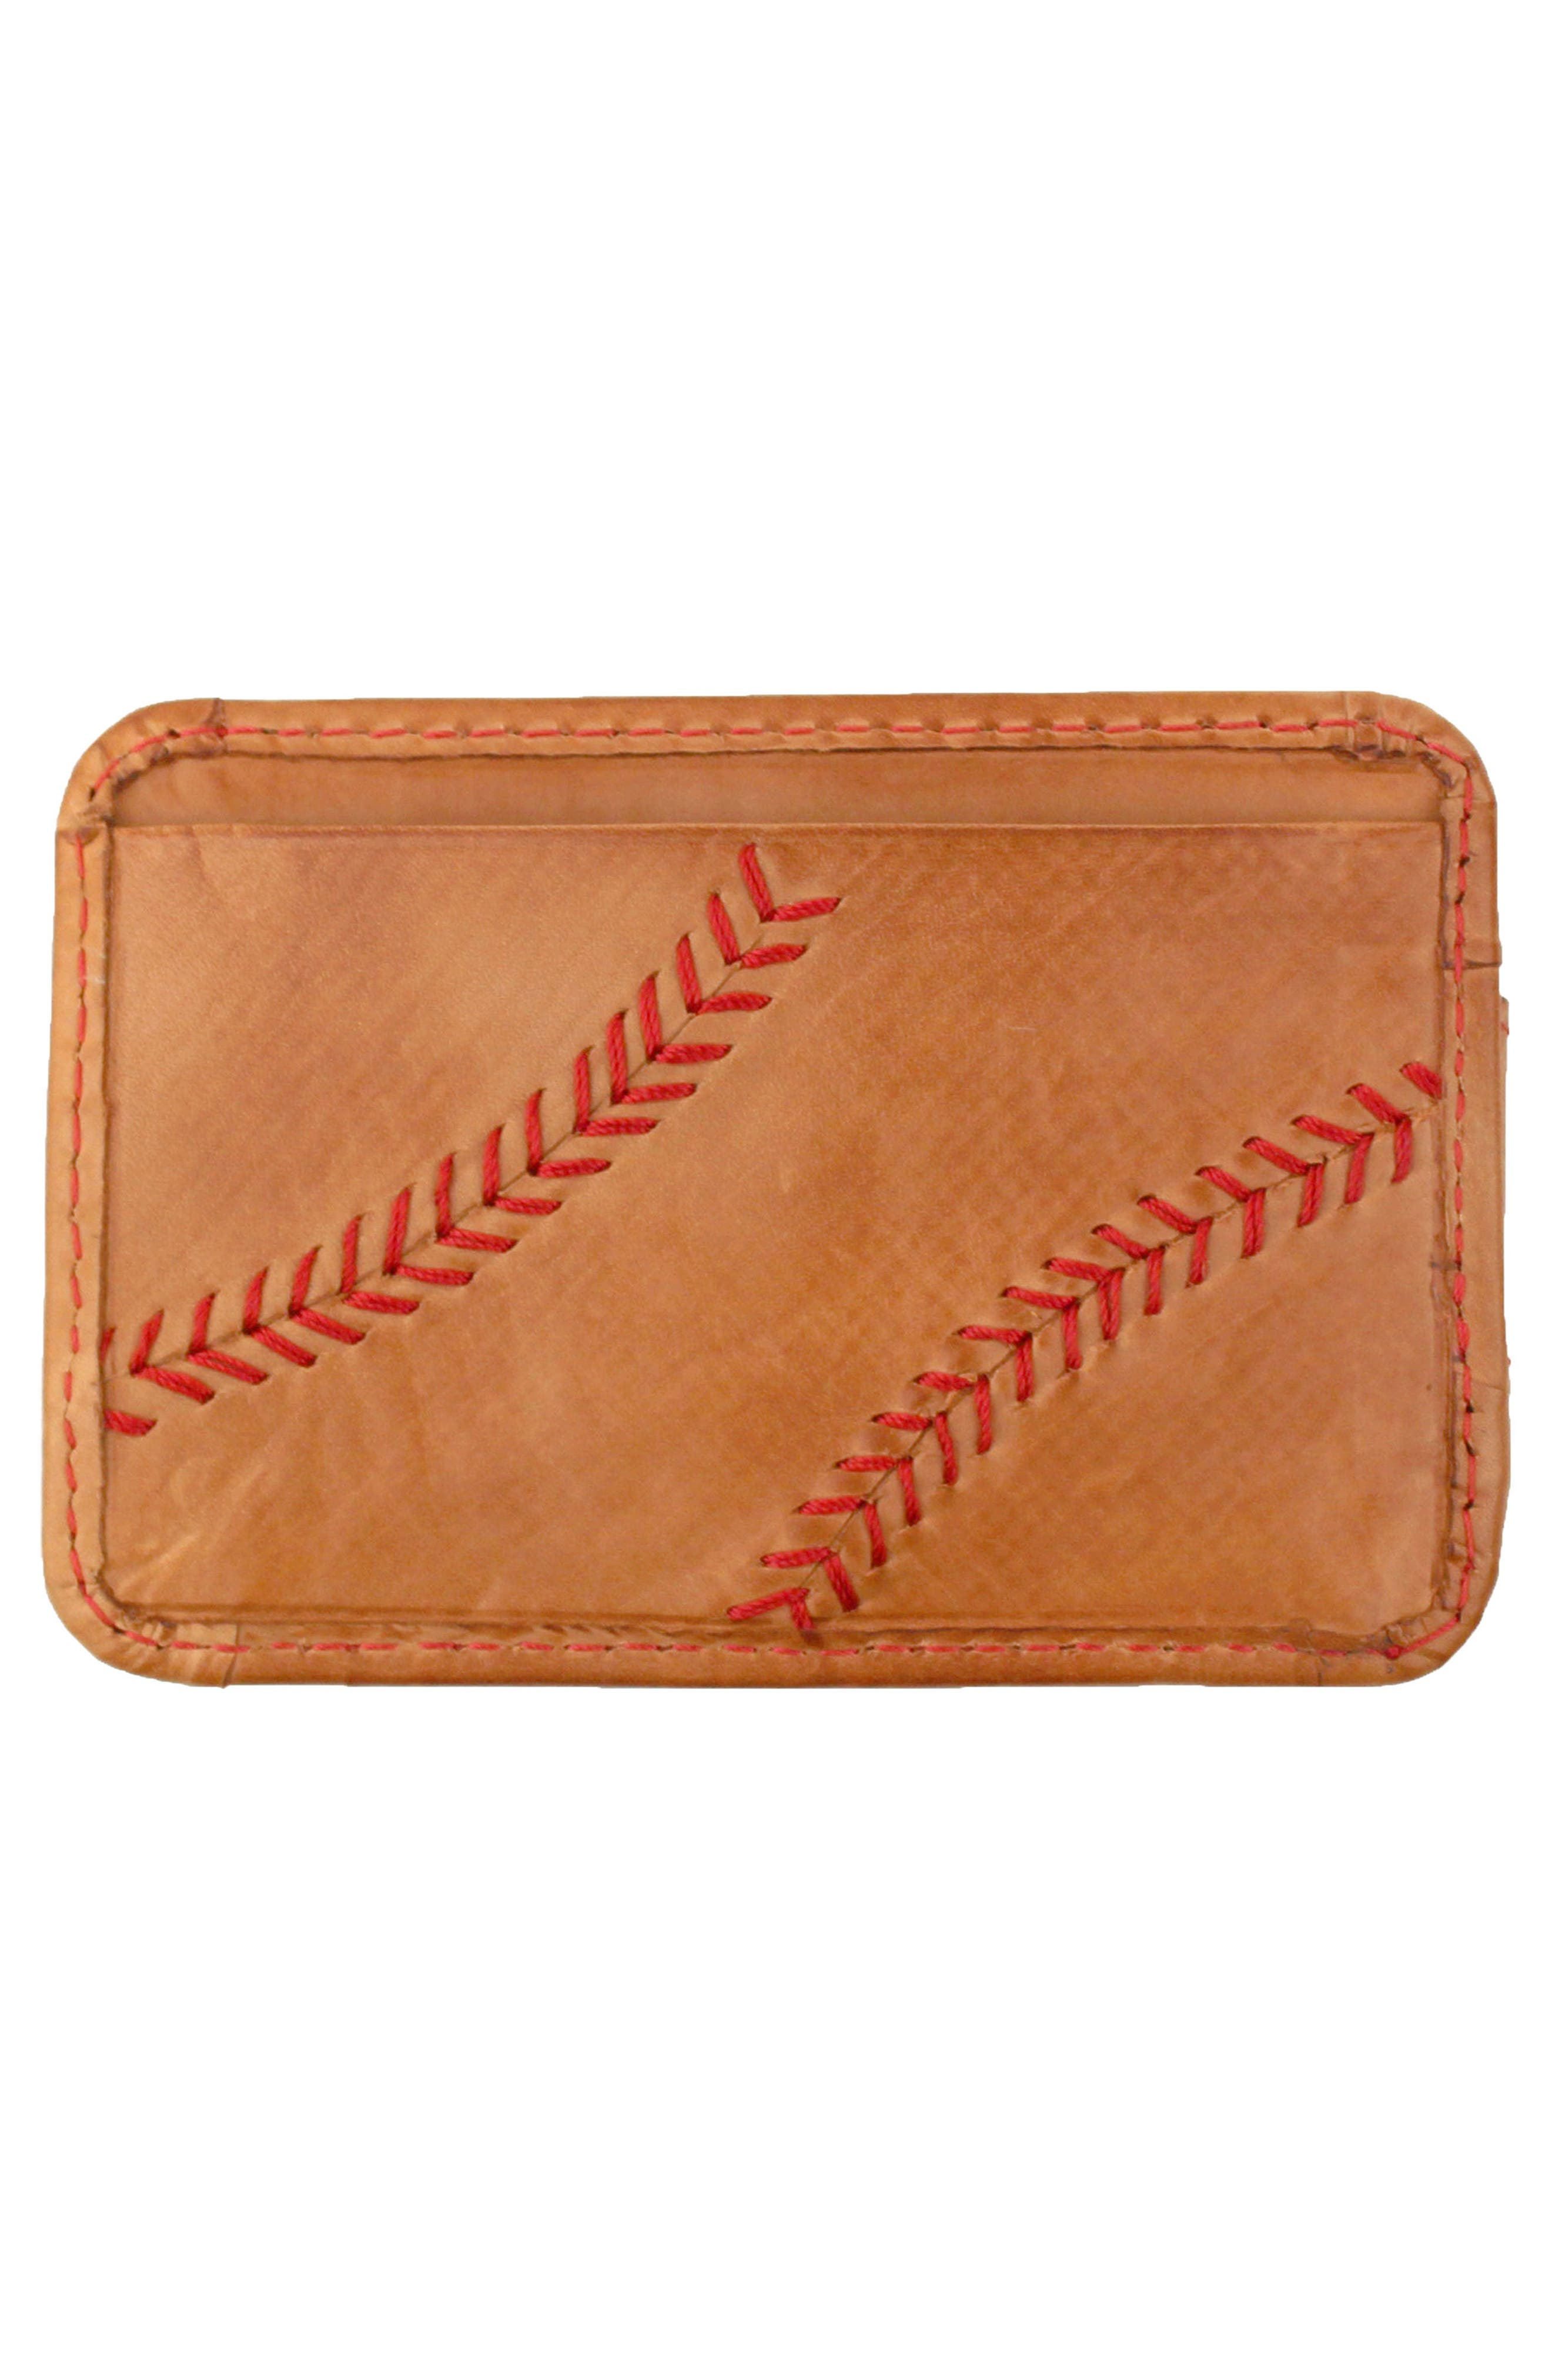 Baseball Stitch Money Clip Card Case,                             Alternate thumbnail 2, color,